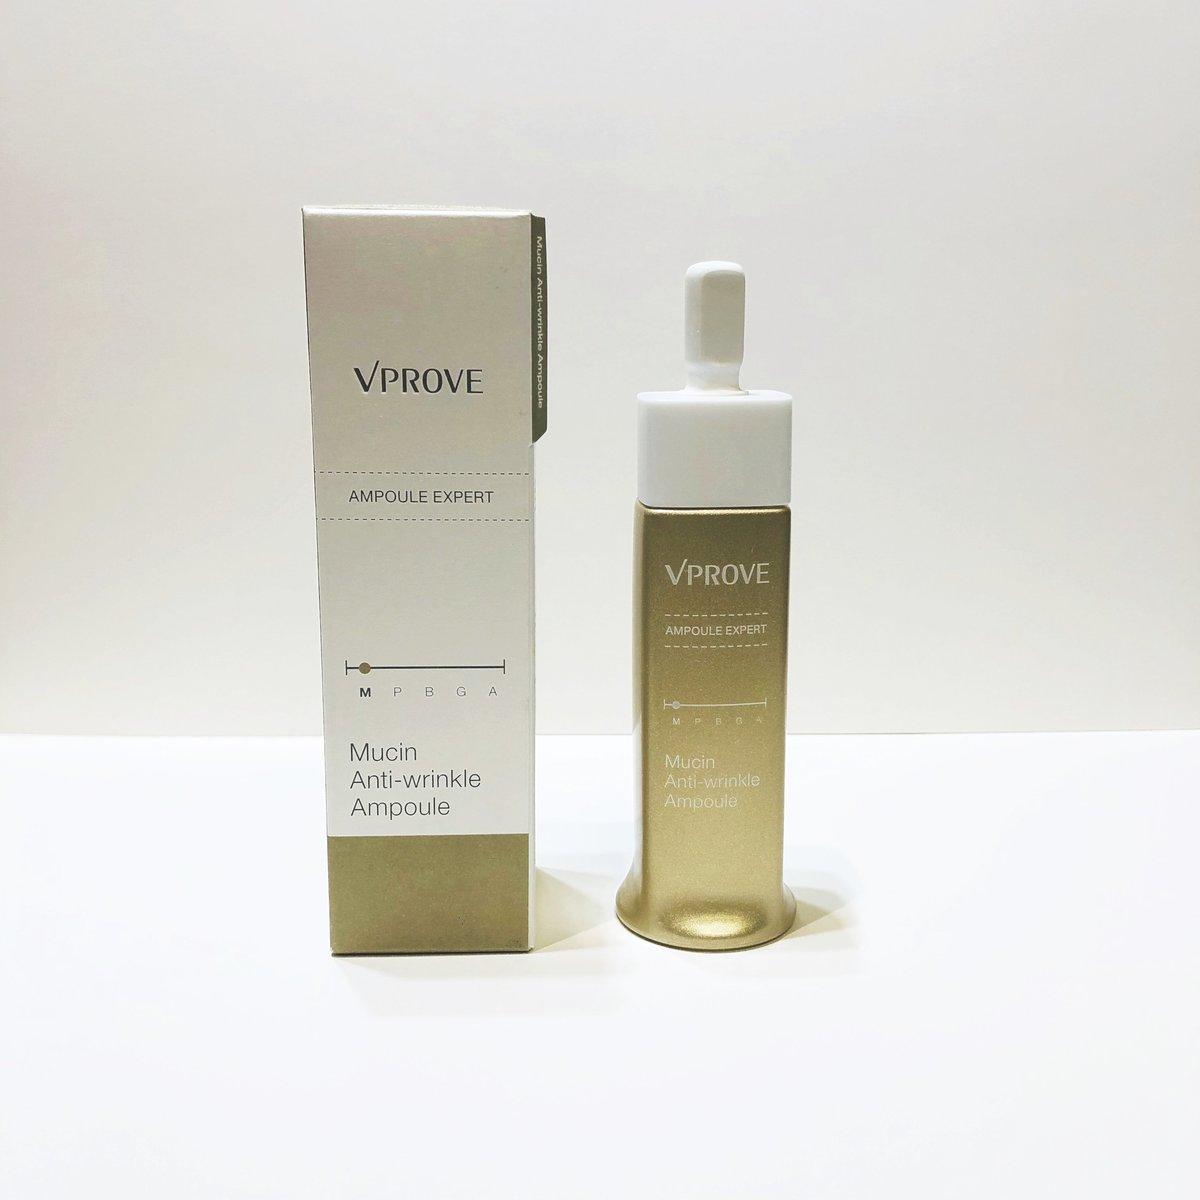 Korea Mucin Anti-wrinkle Ampoule【Parallel Import】